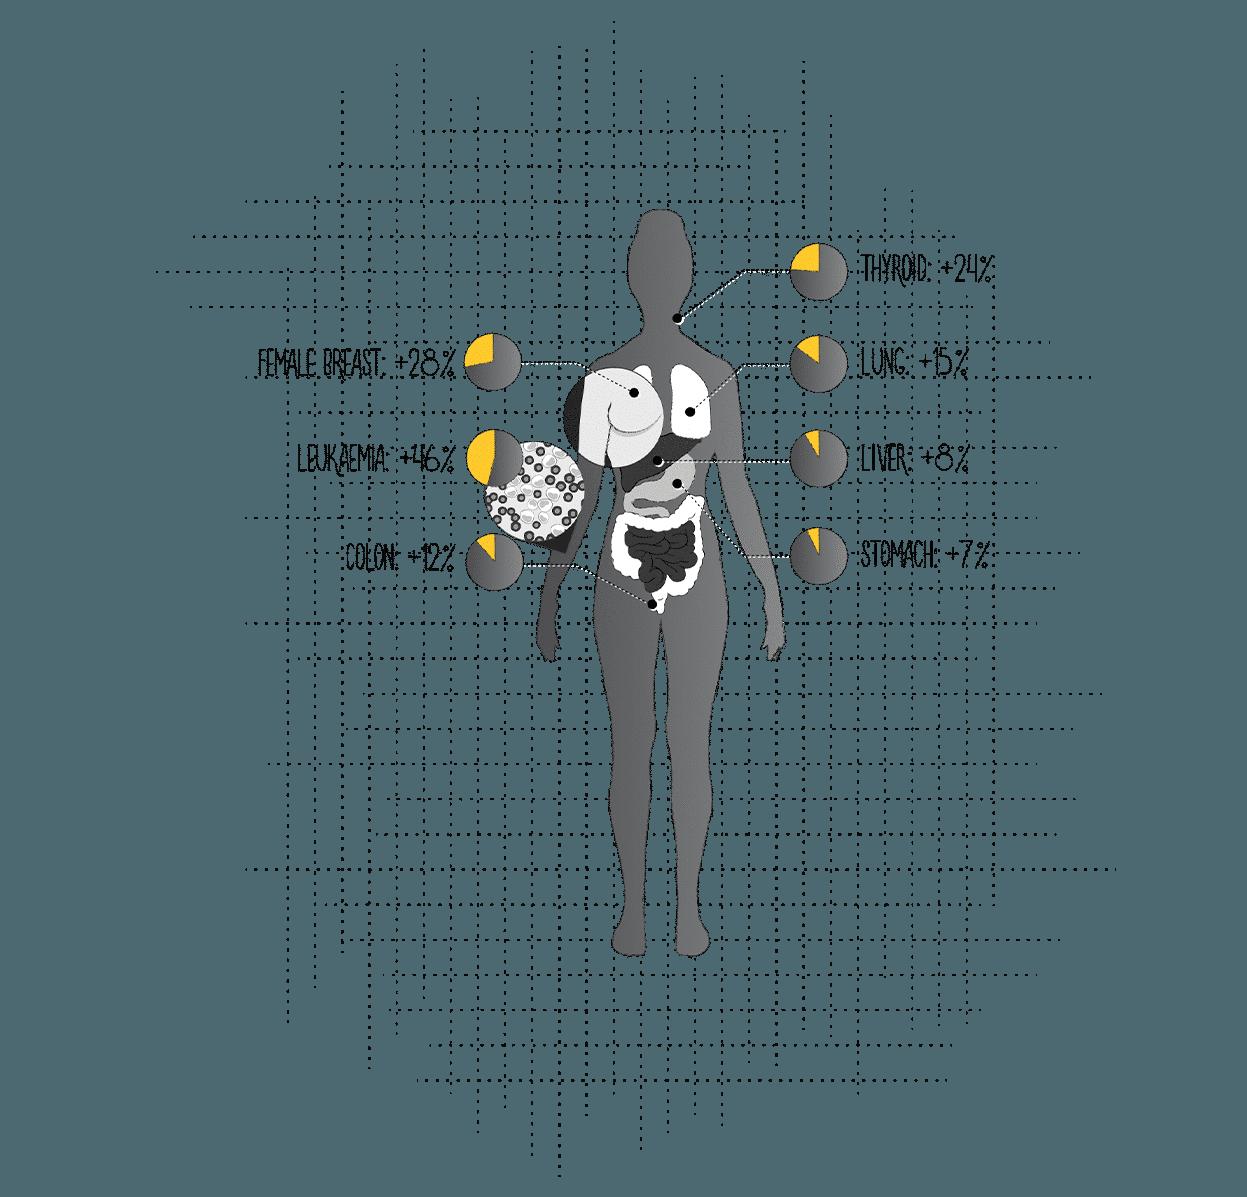 causes of hiroshima